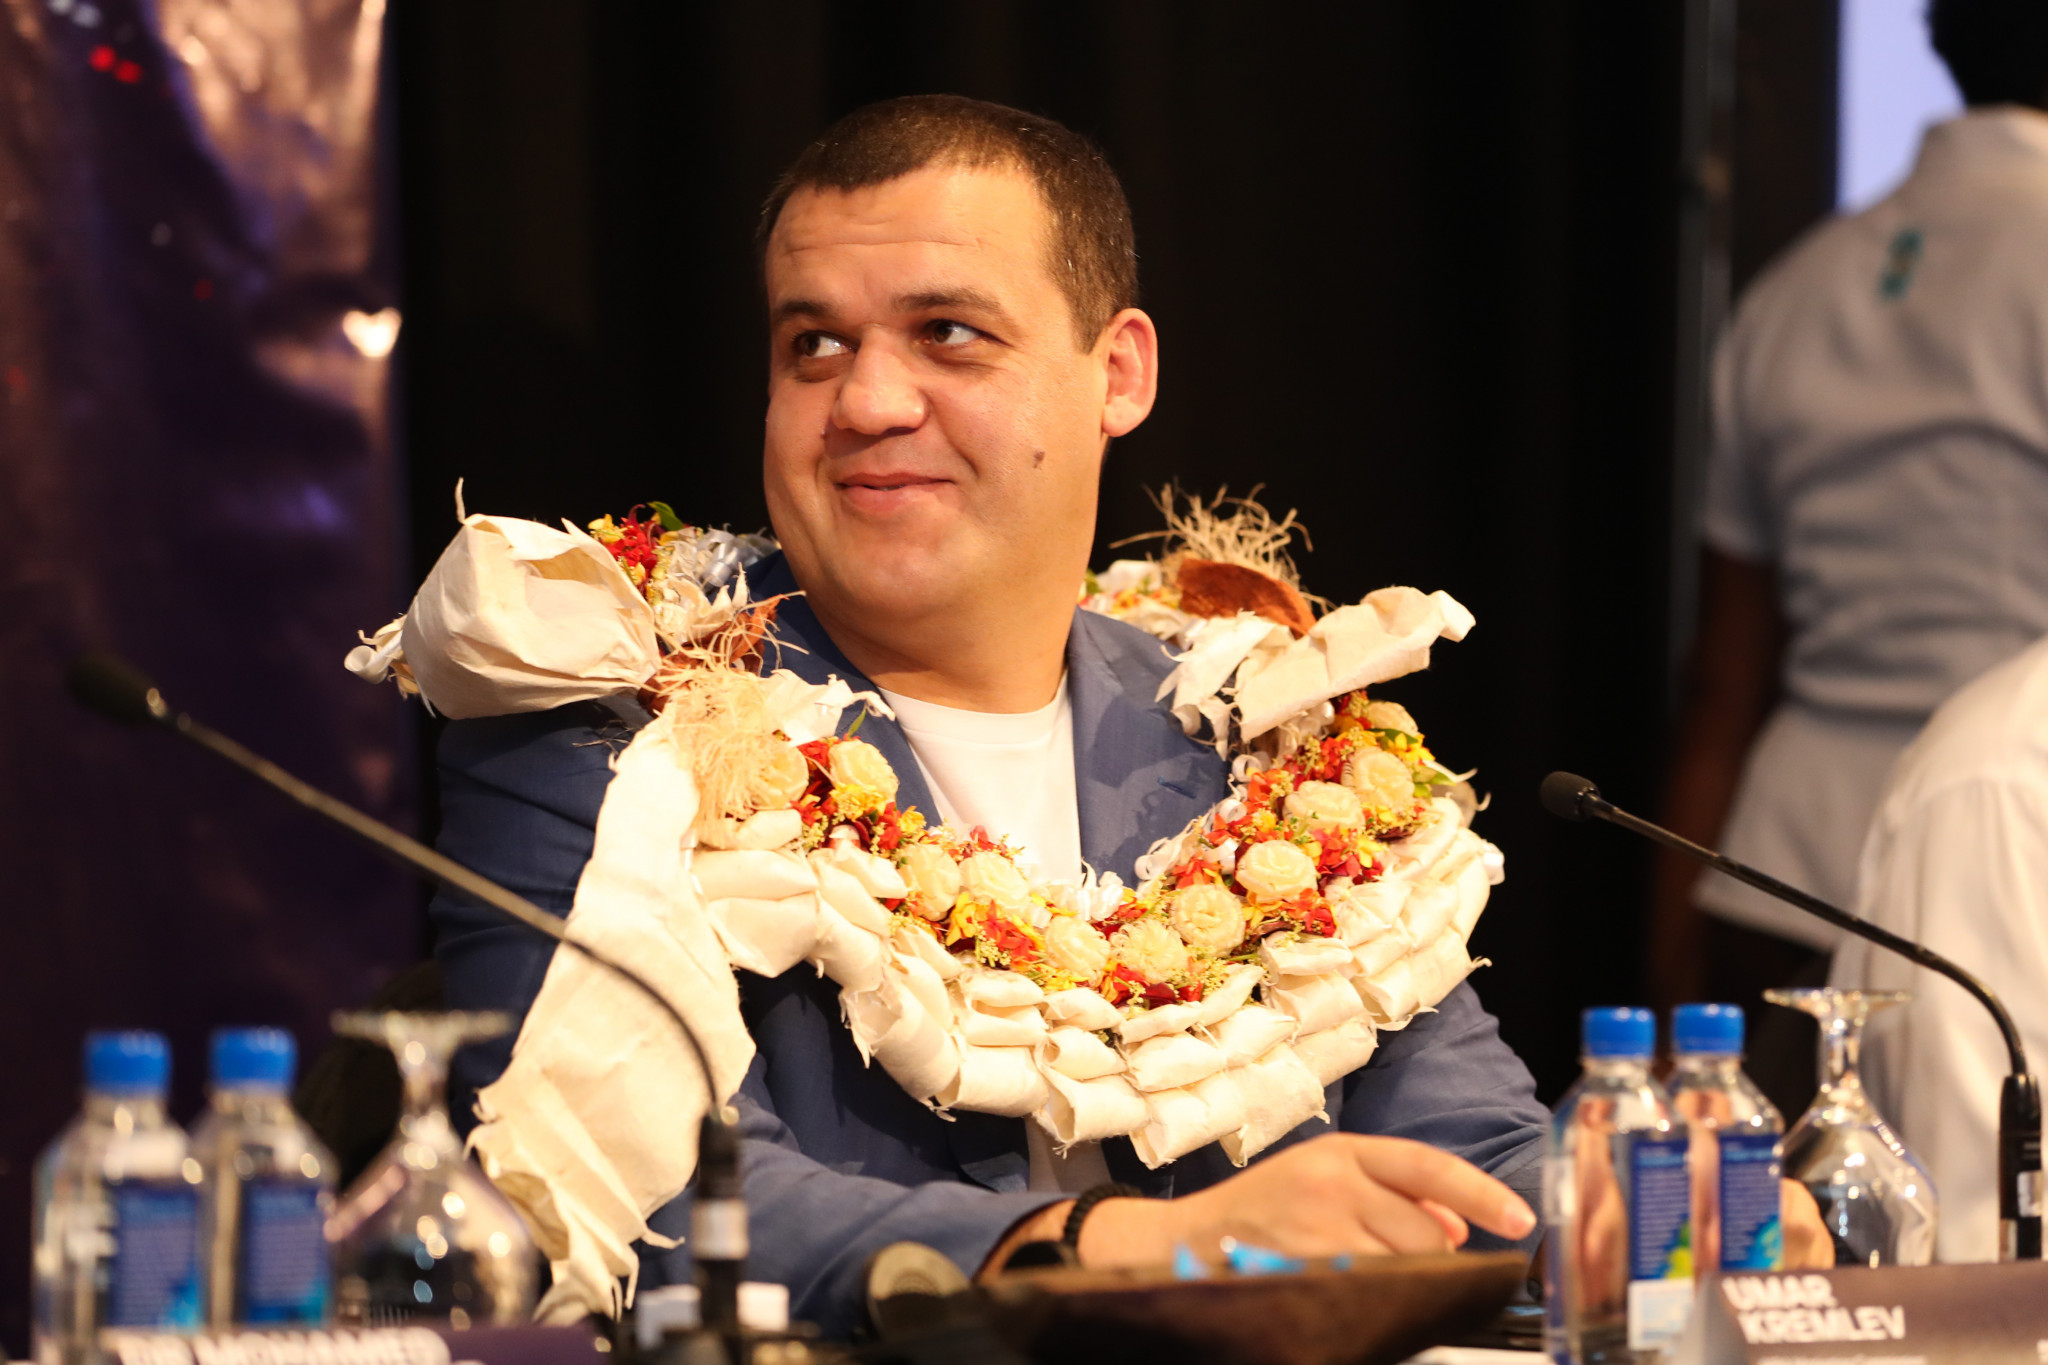 As was AIBA Marketing Commission chair Umar Kremlev ©AIBA